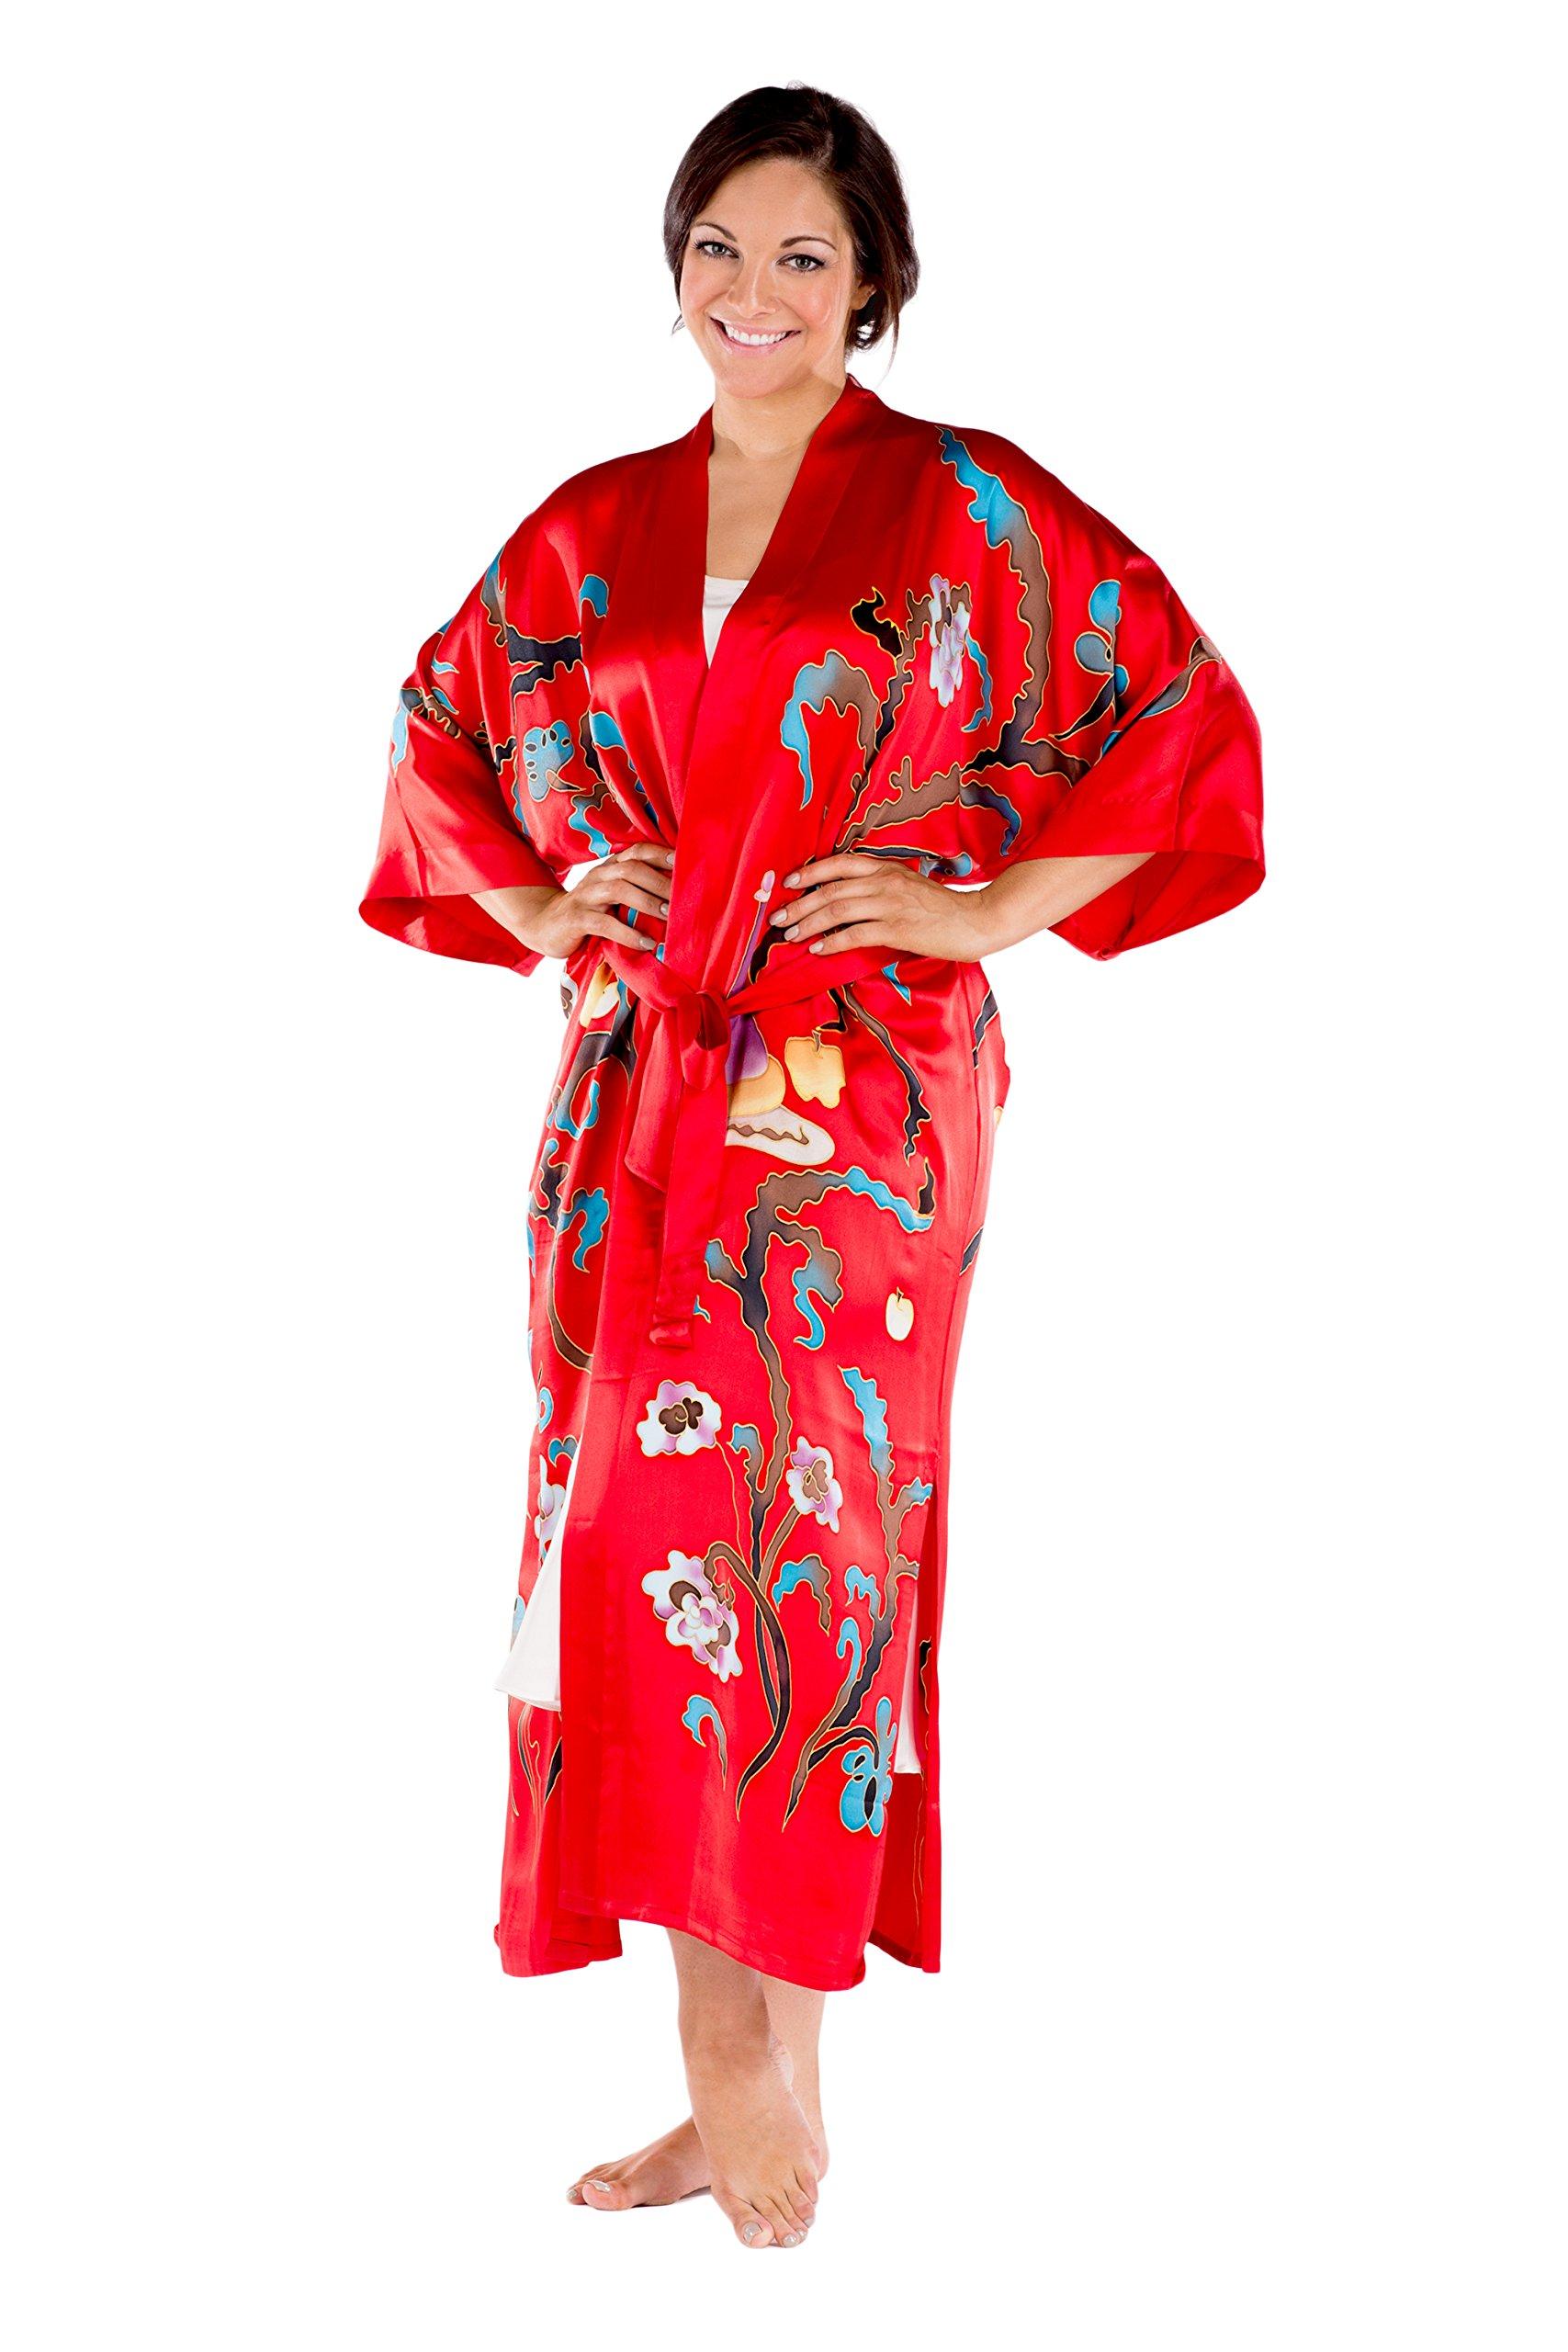 Women's Luxury Silk Kimono Robe - Beautiful Gift Ideas by TexereSilk (Graza, Venetian Red, Small/Medium) Great Gifts for Women WS0104-VRD-SM